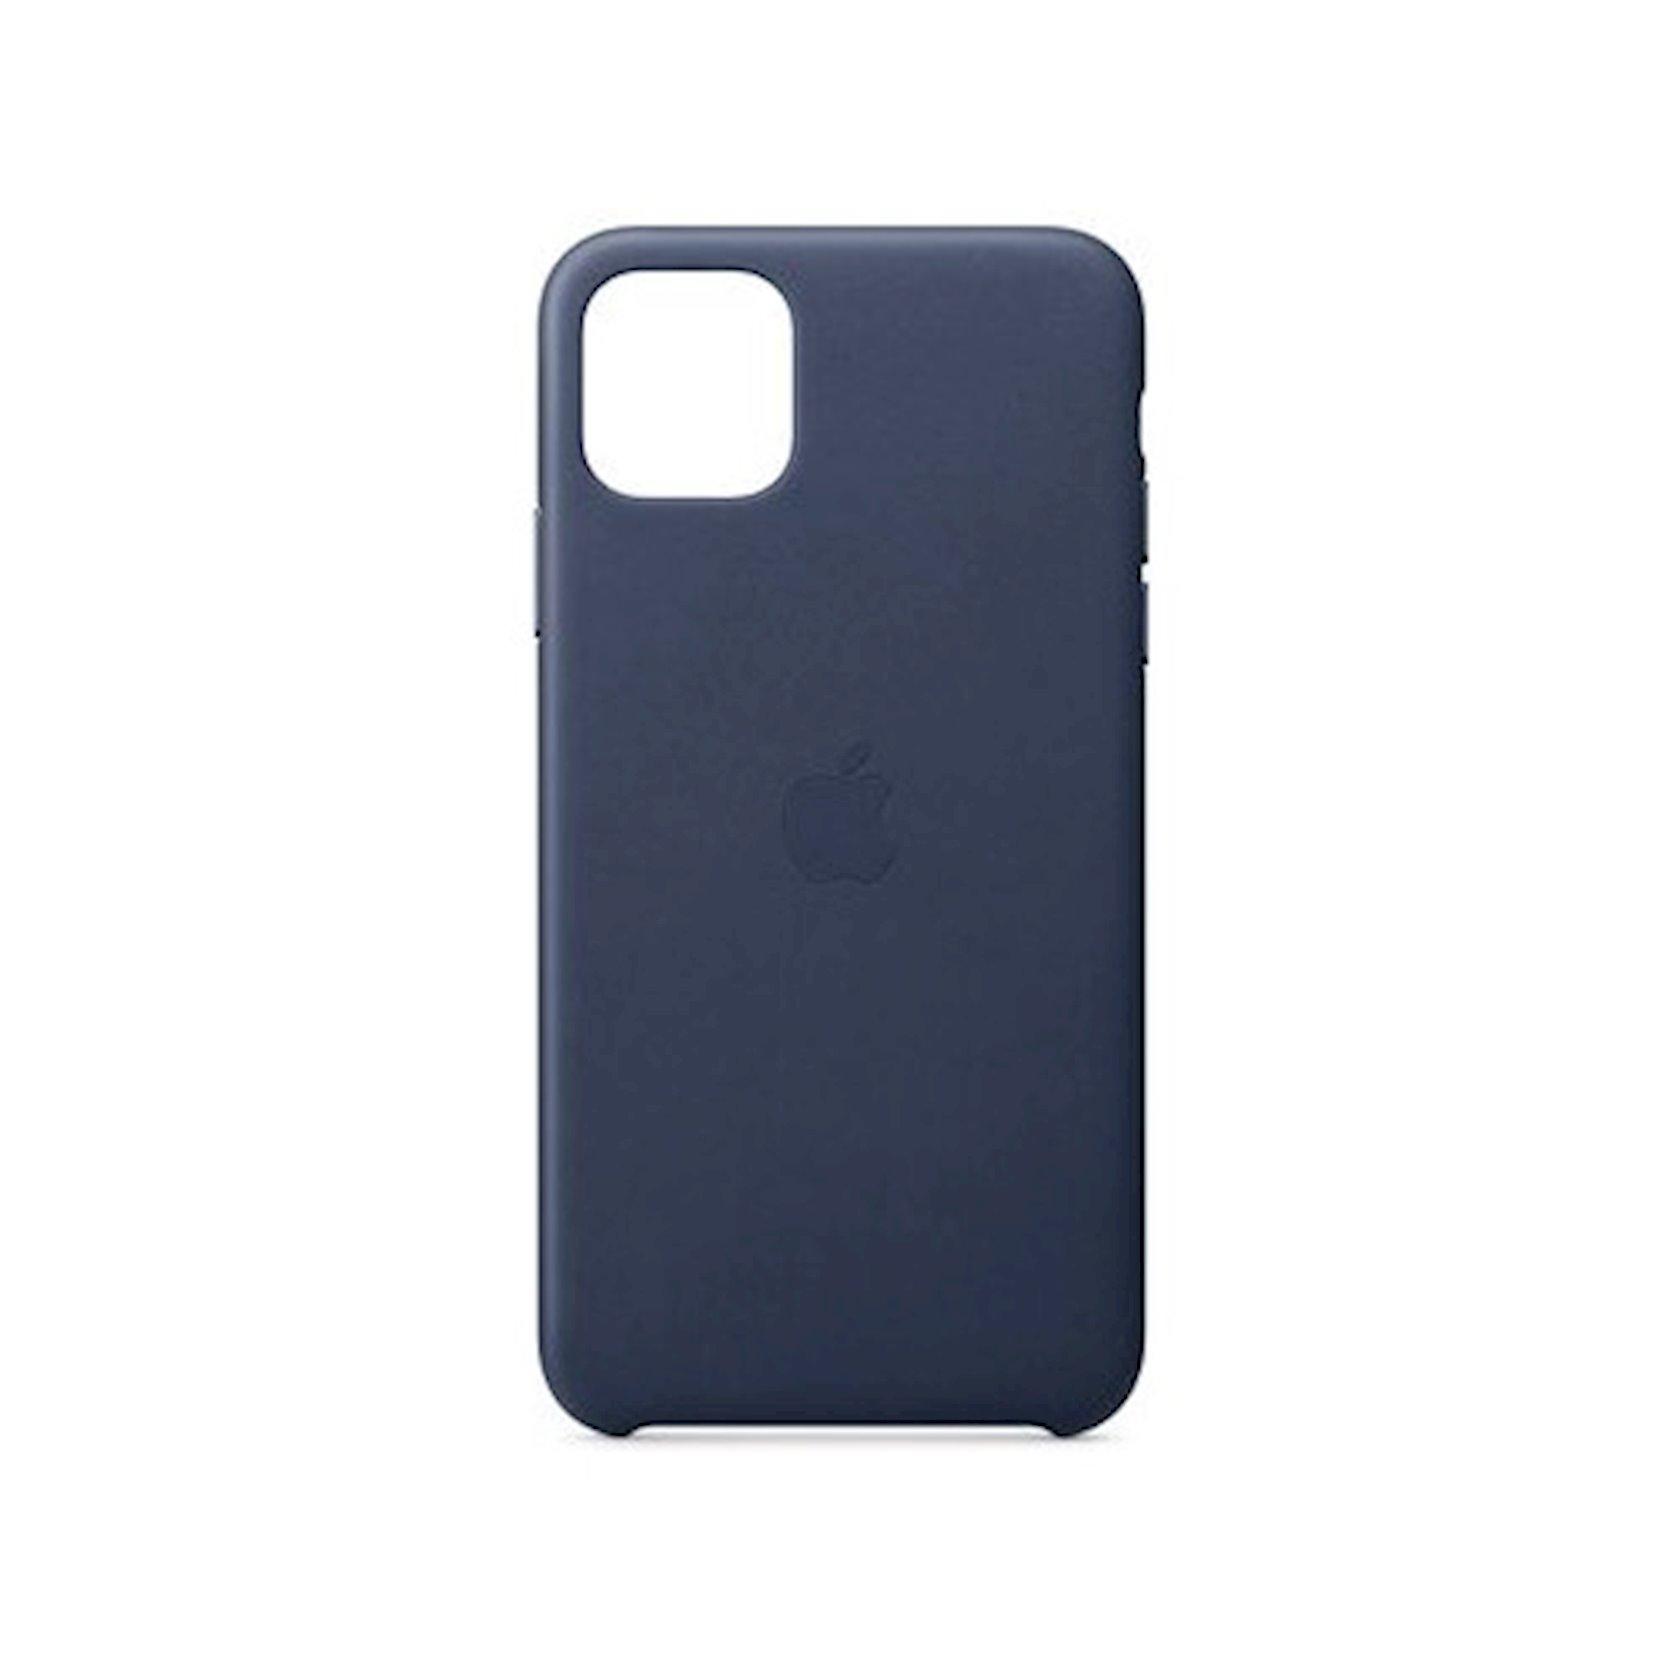 Çexol Leather Case Apple iPhone 11 Pro Max üçün Midnight Blue